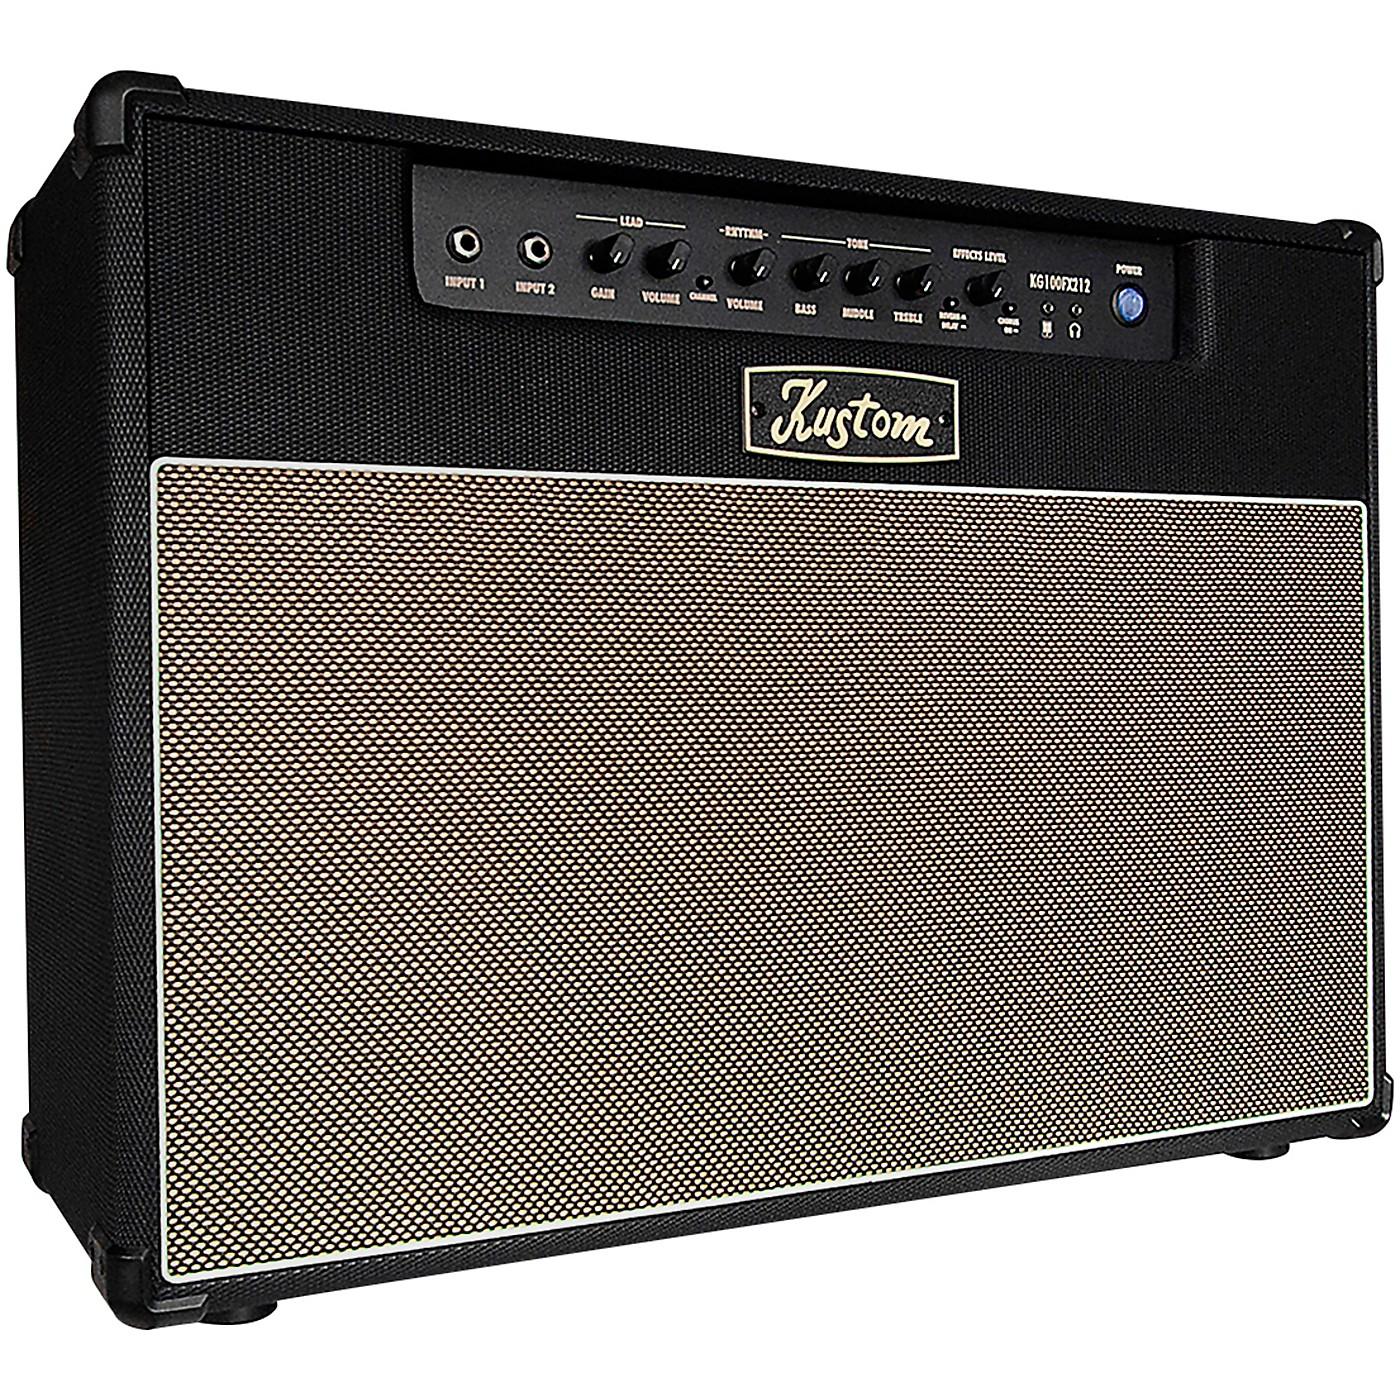 Kustom KG100FX212 100-Watt 2x12 Guitar Combo Amplifier thumbnail